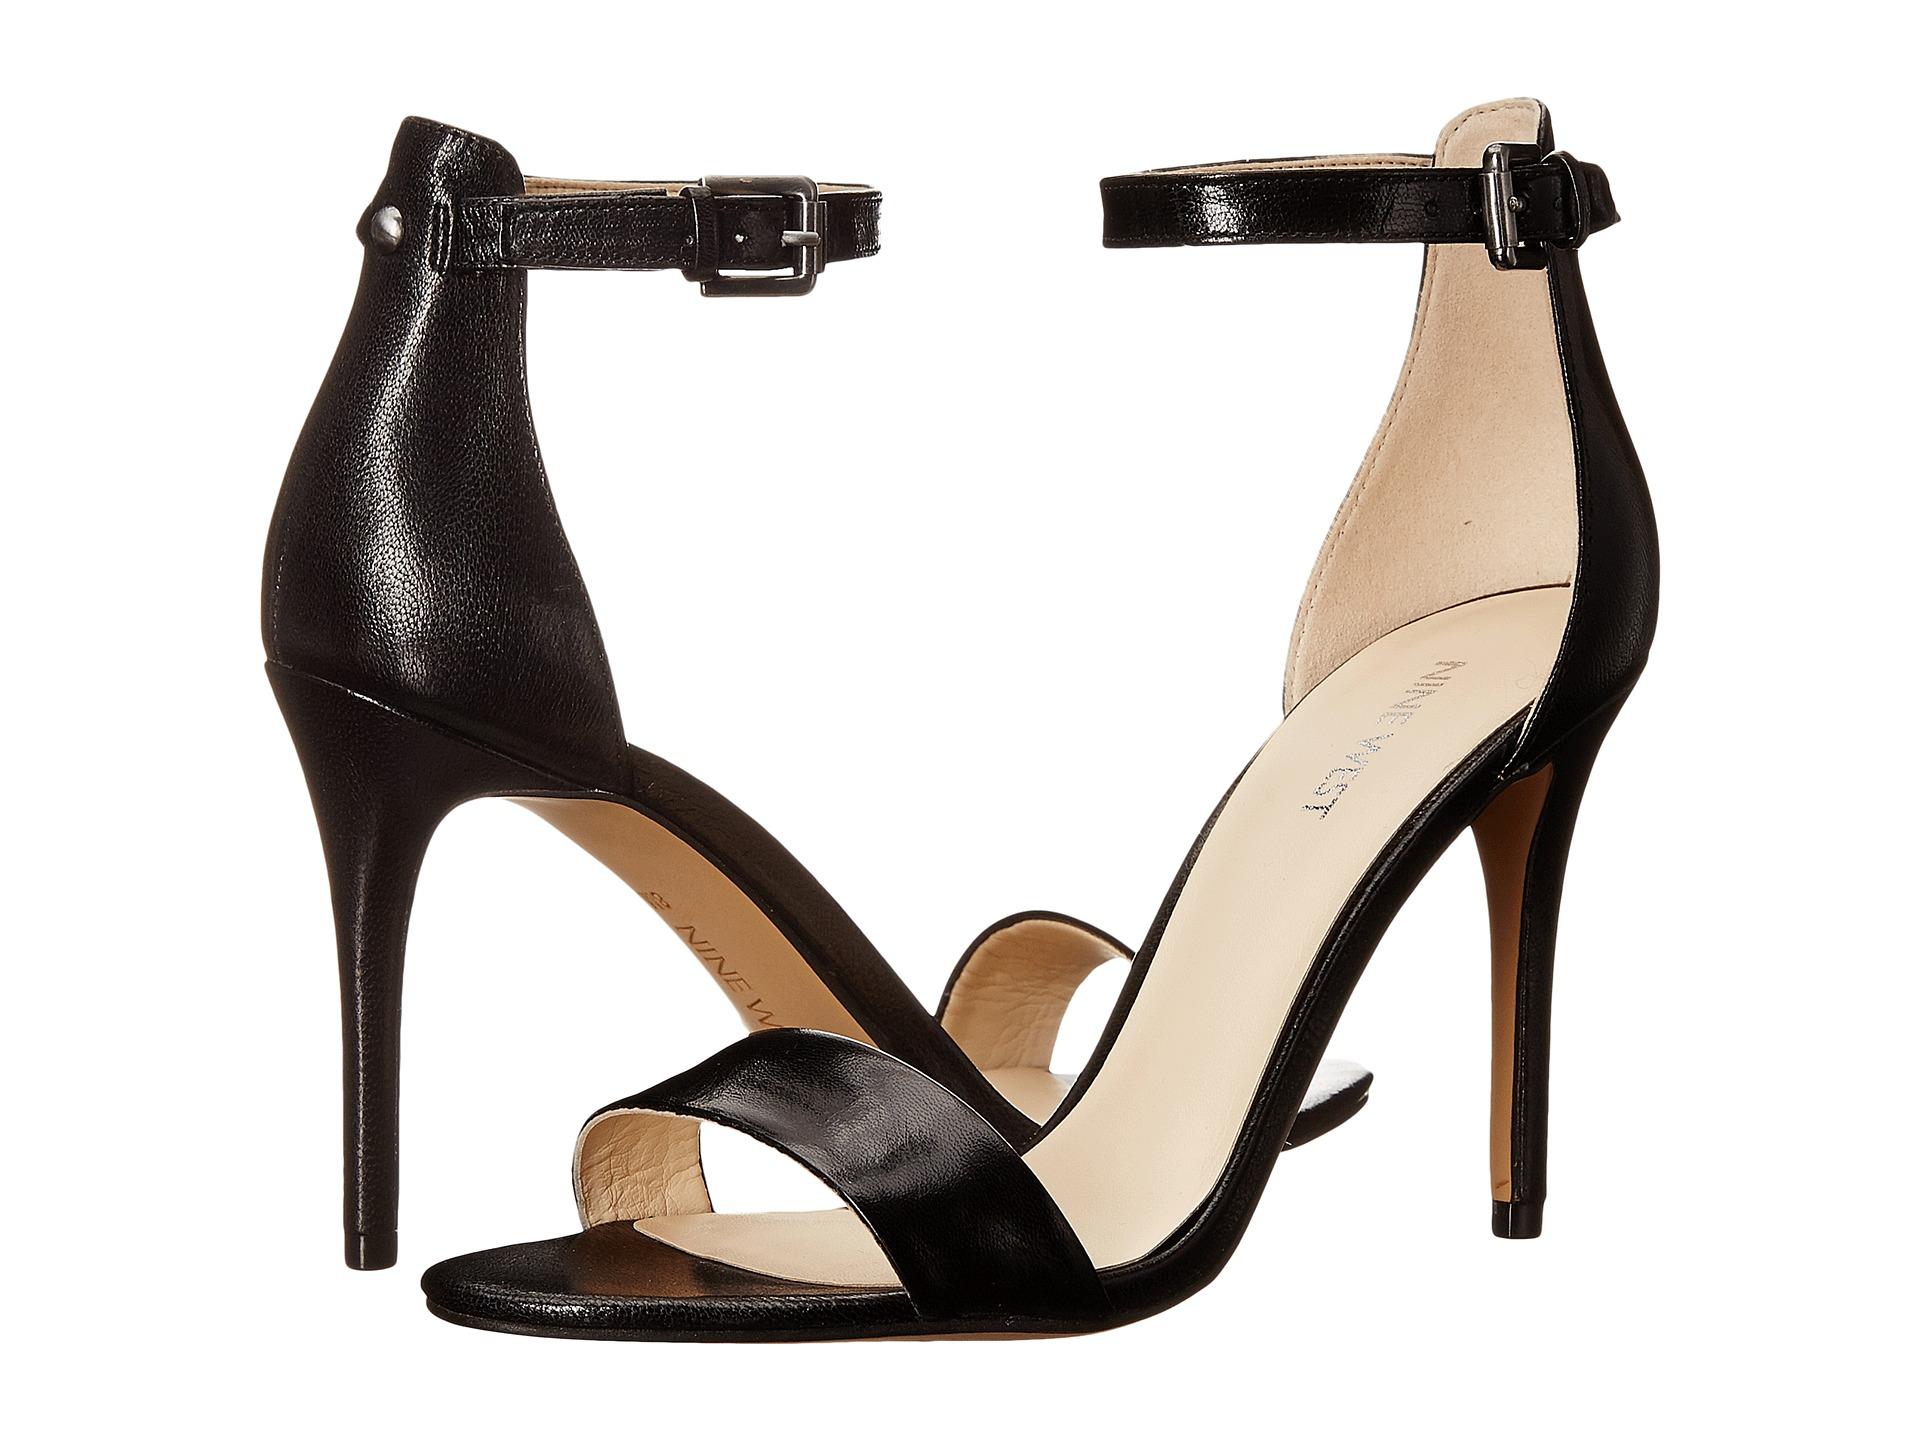 Black sandals nine west - Black Sandals Nine West 29